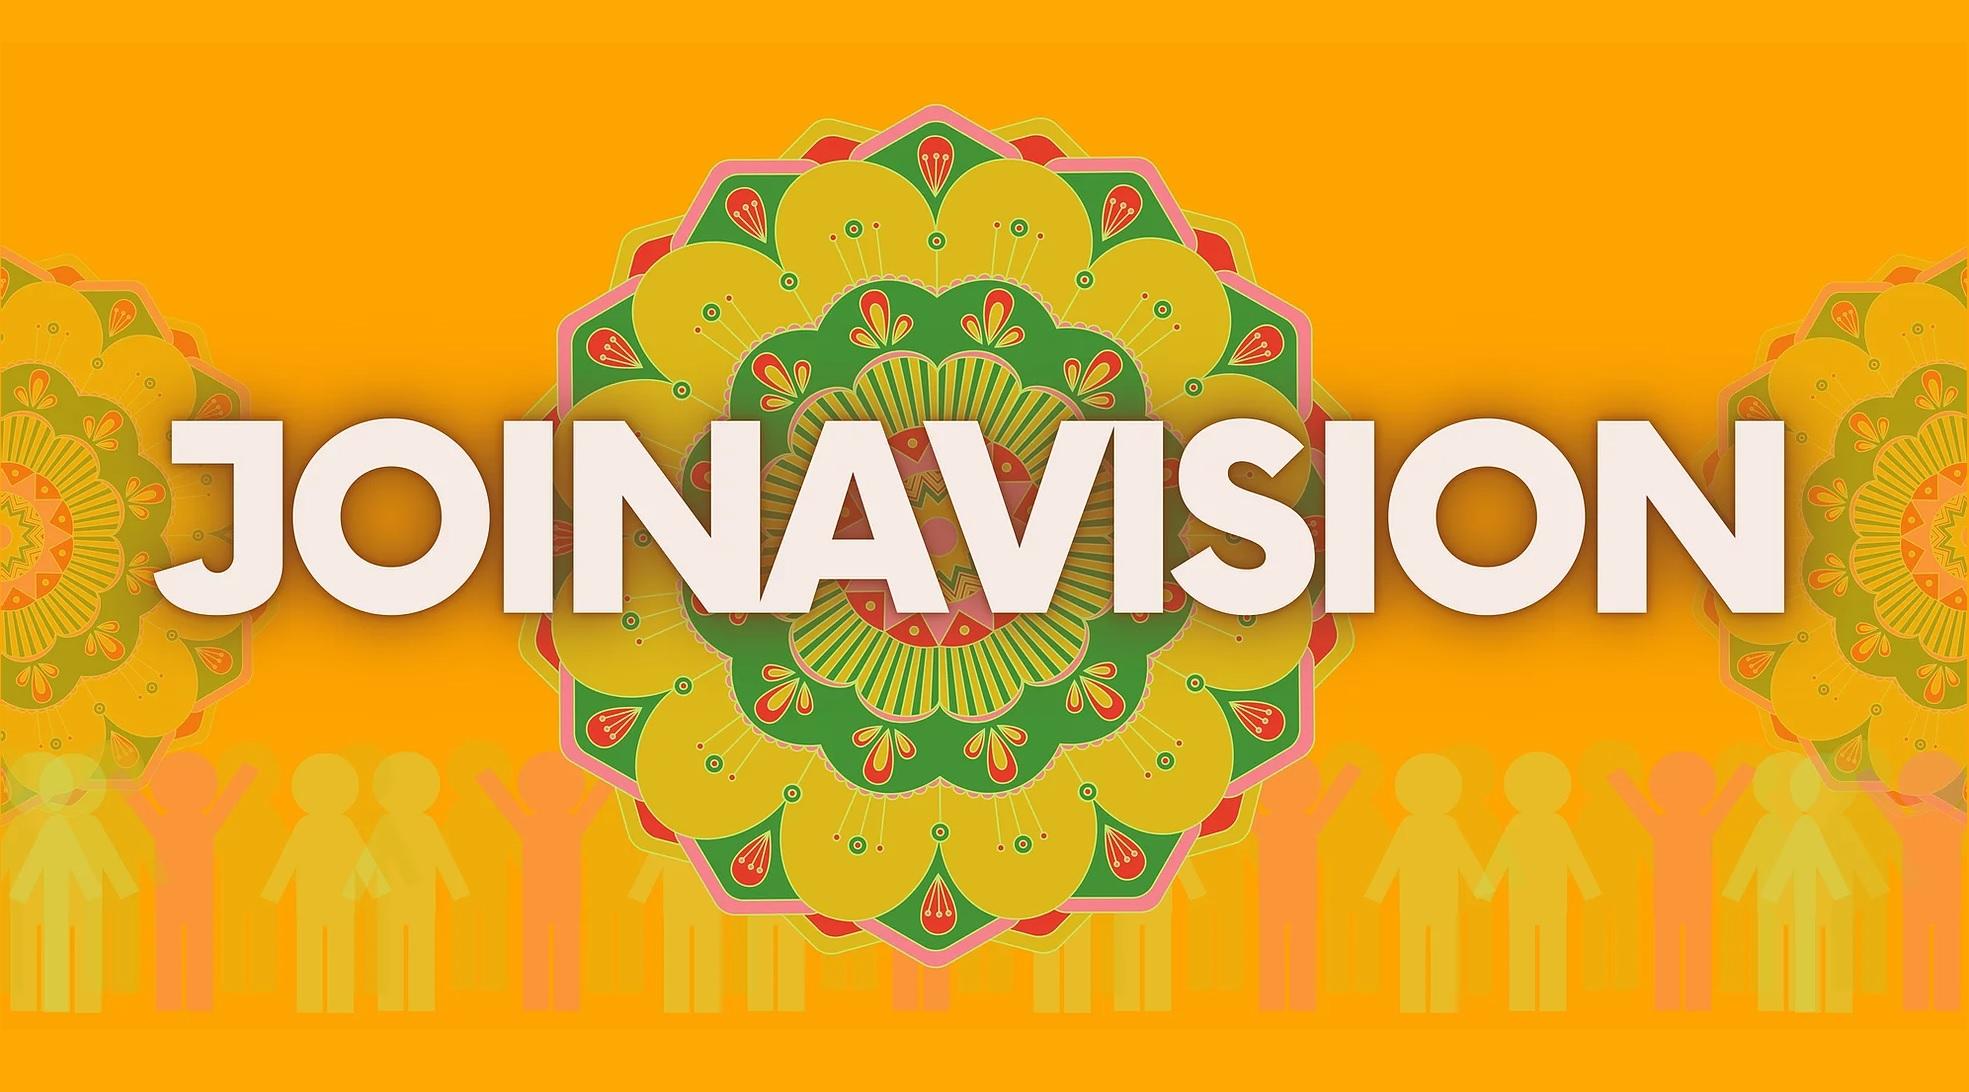 JoinAVision